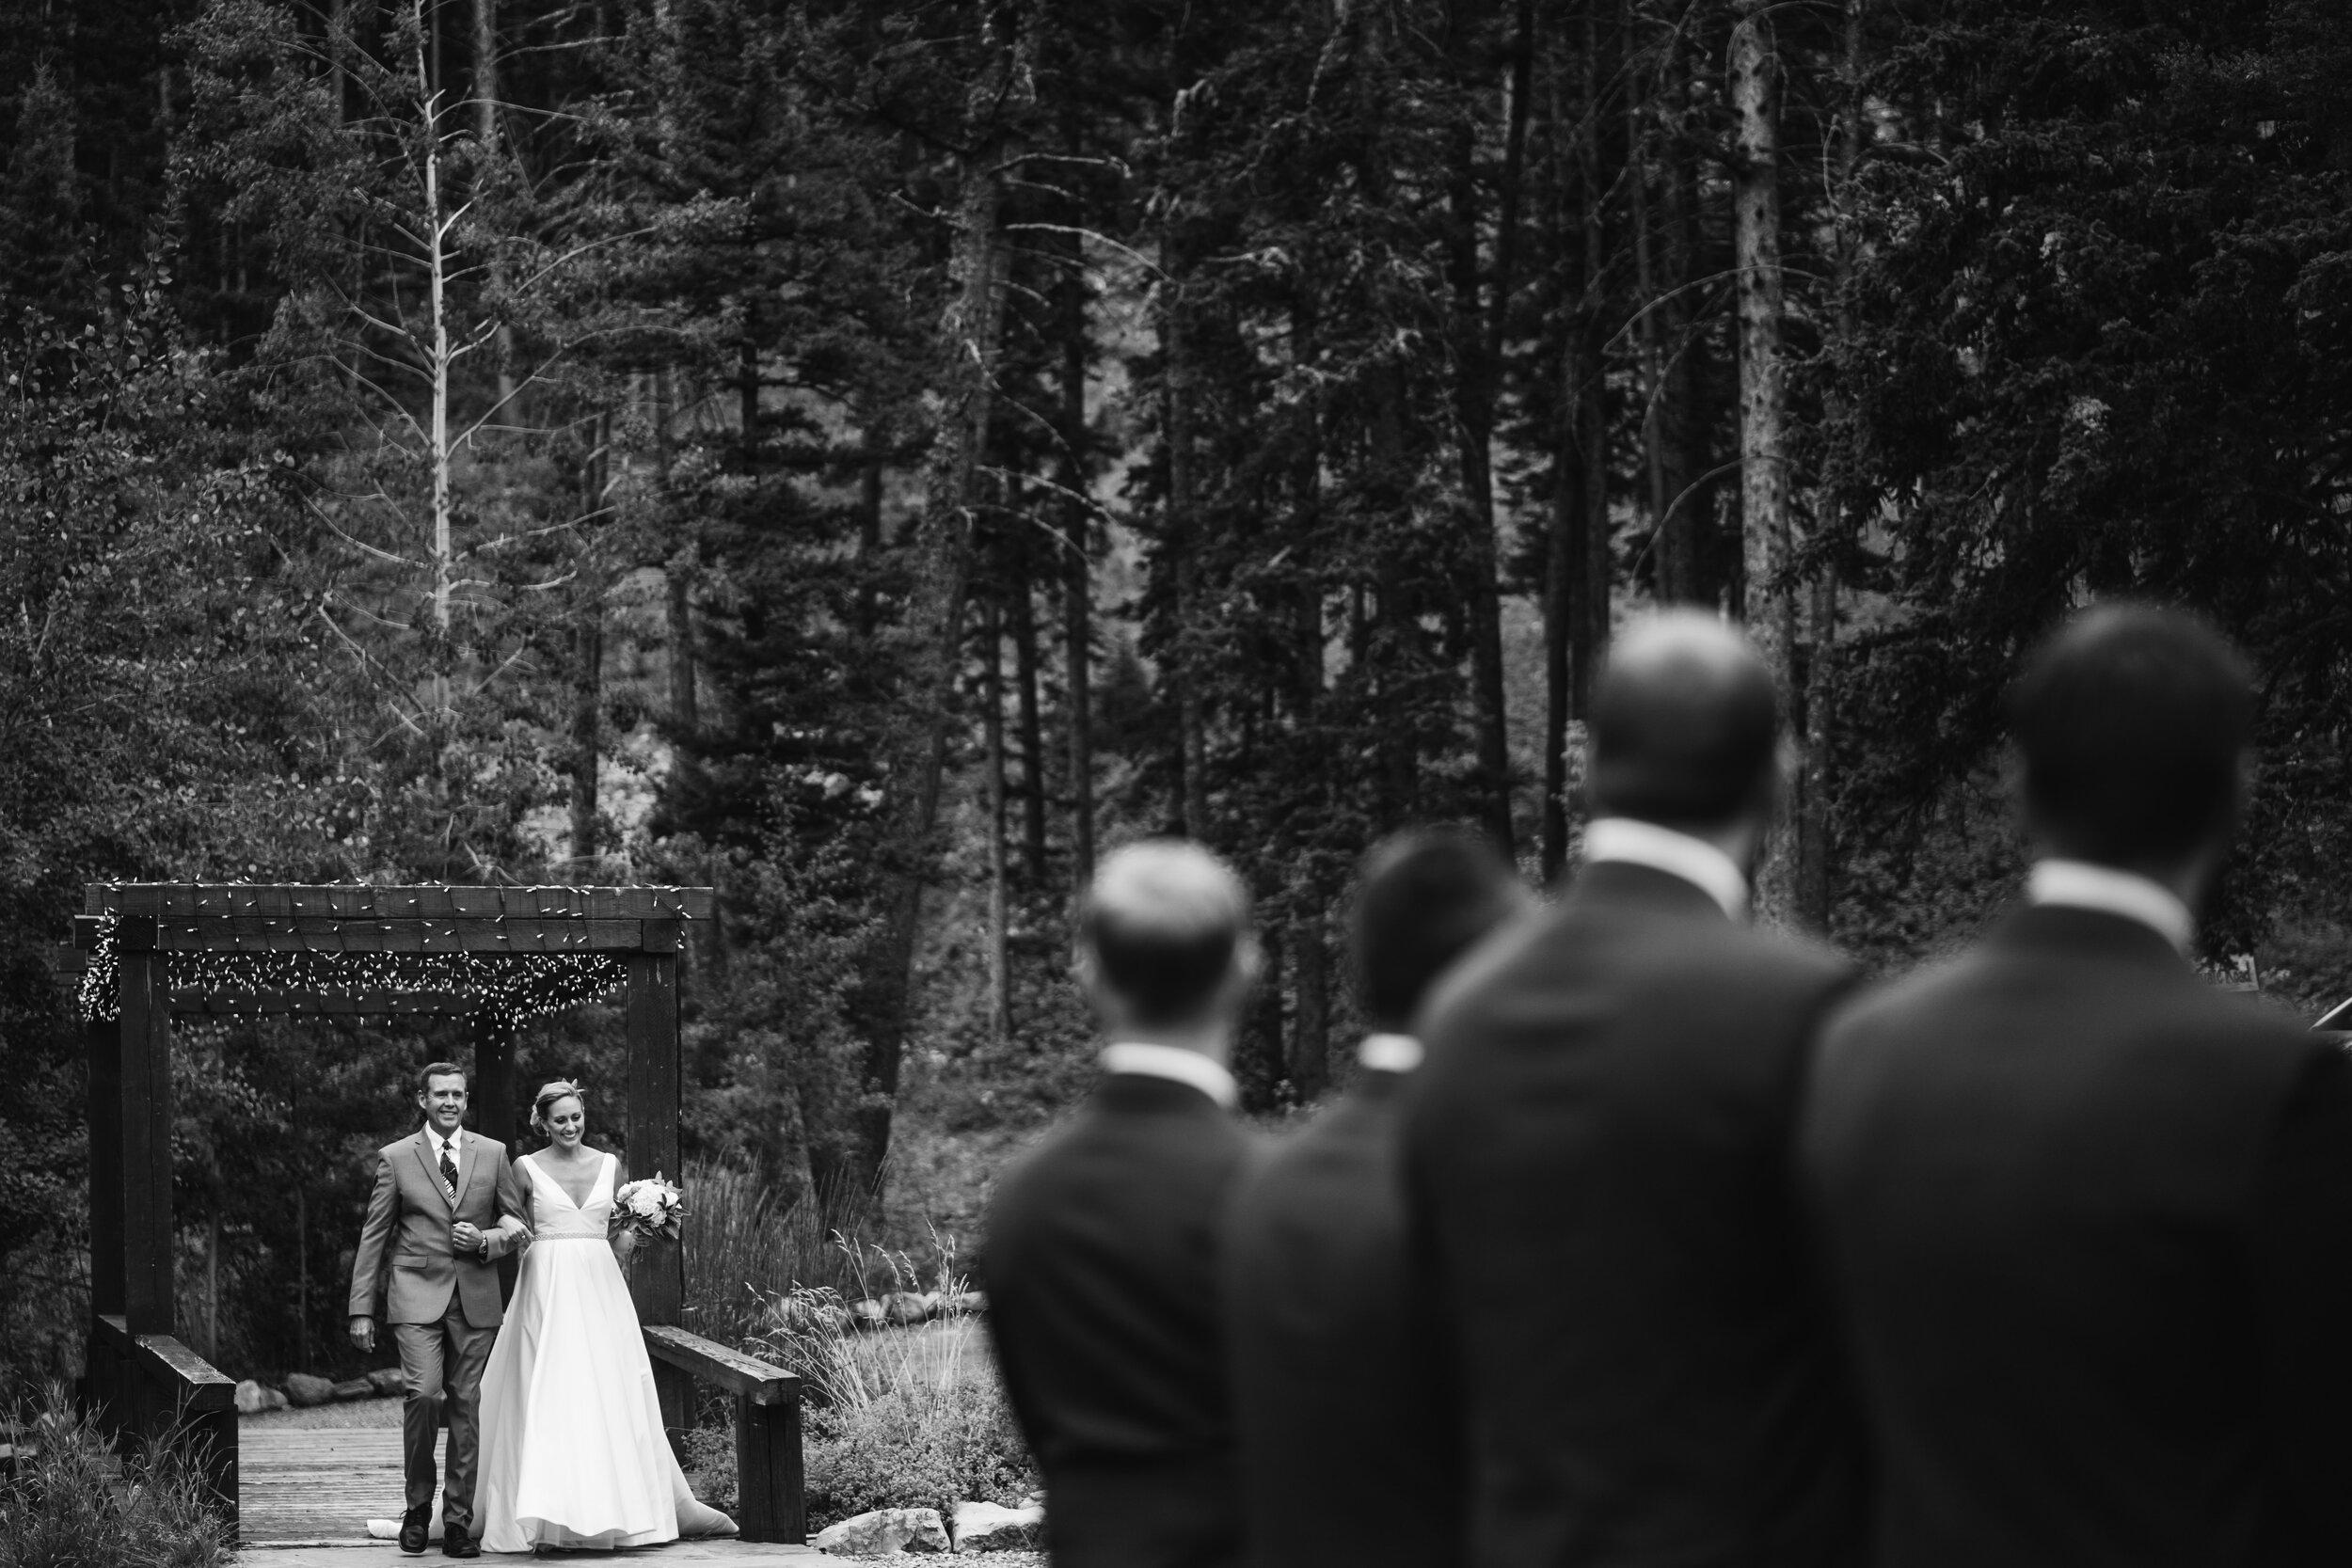 kent-wedding-photography-105058.jpg